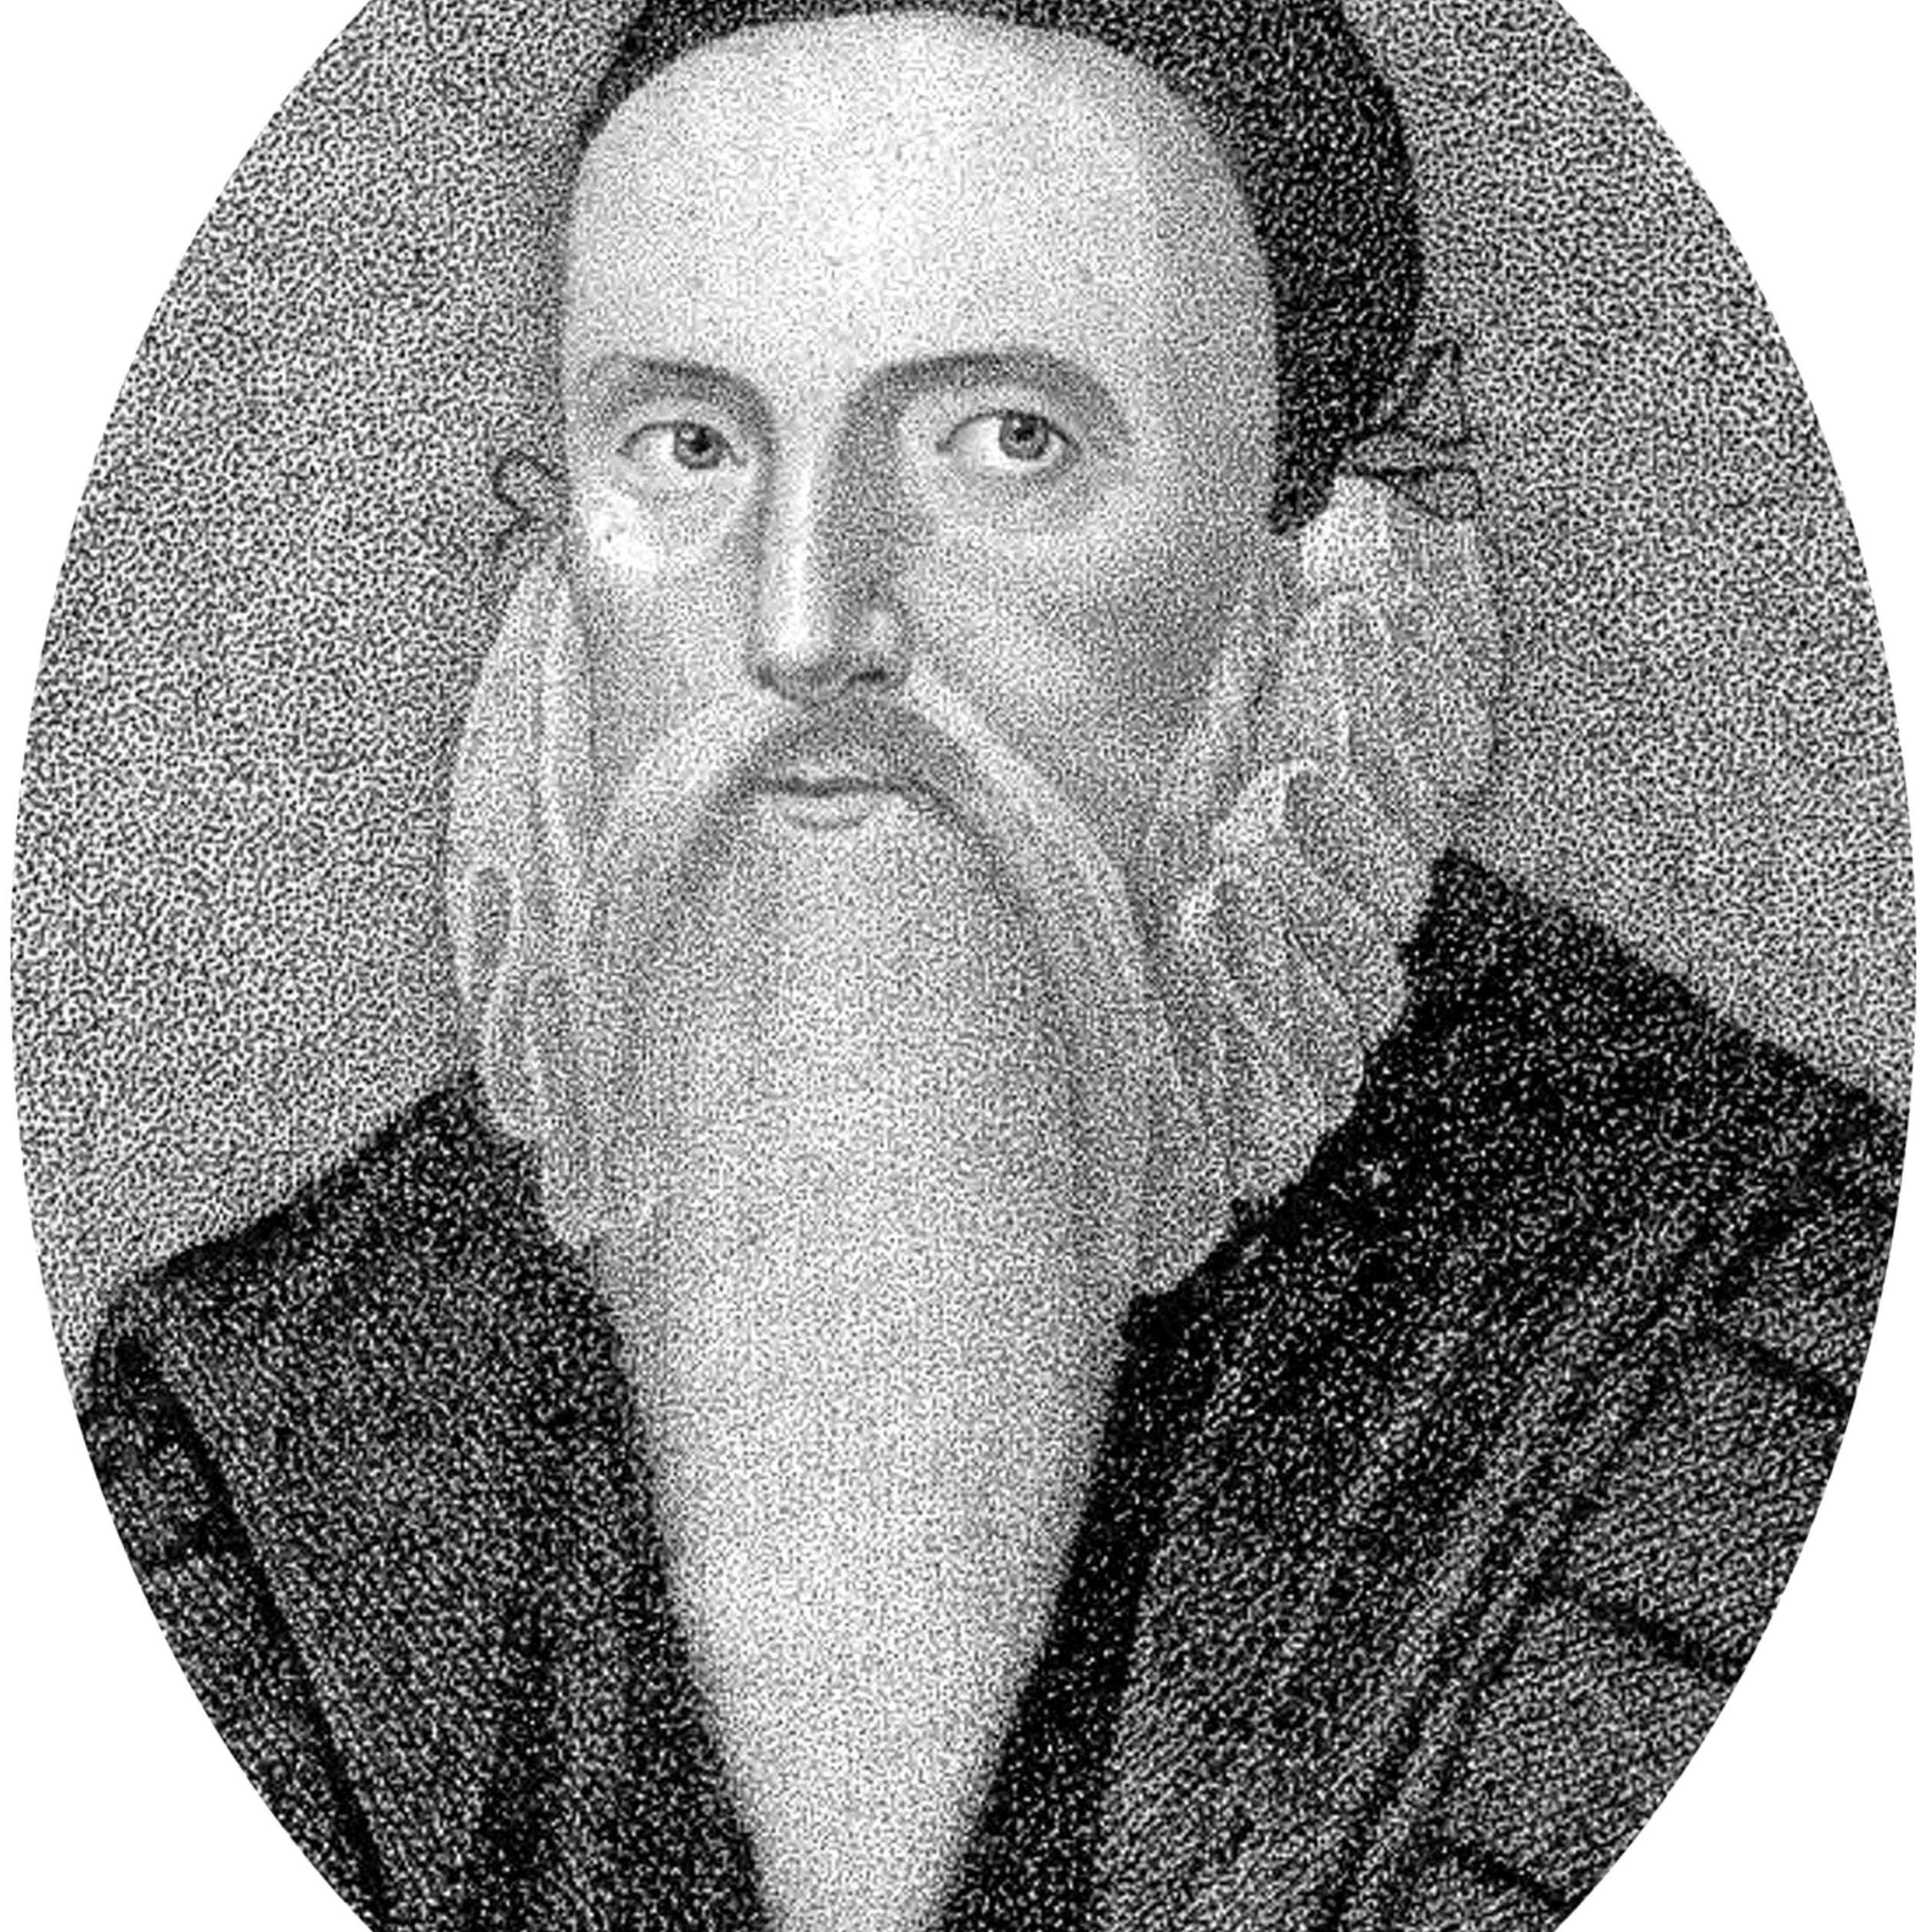 Dr. John Dee (1527-1608) scientist philosopher, mathematician